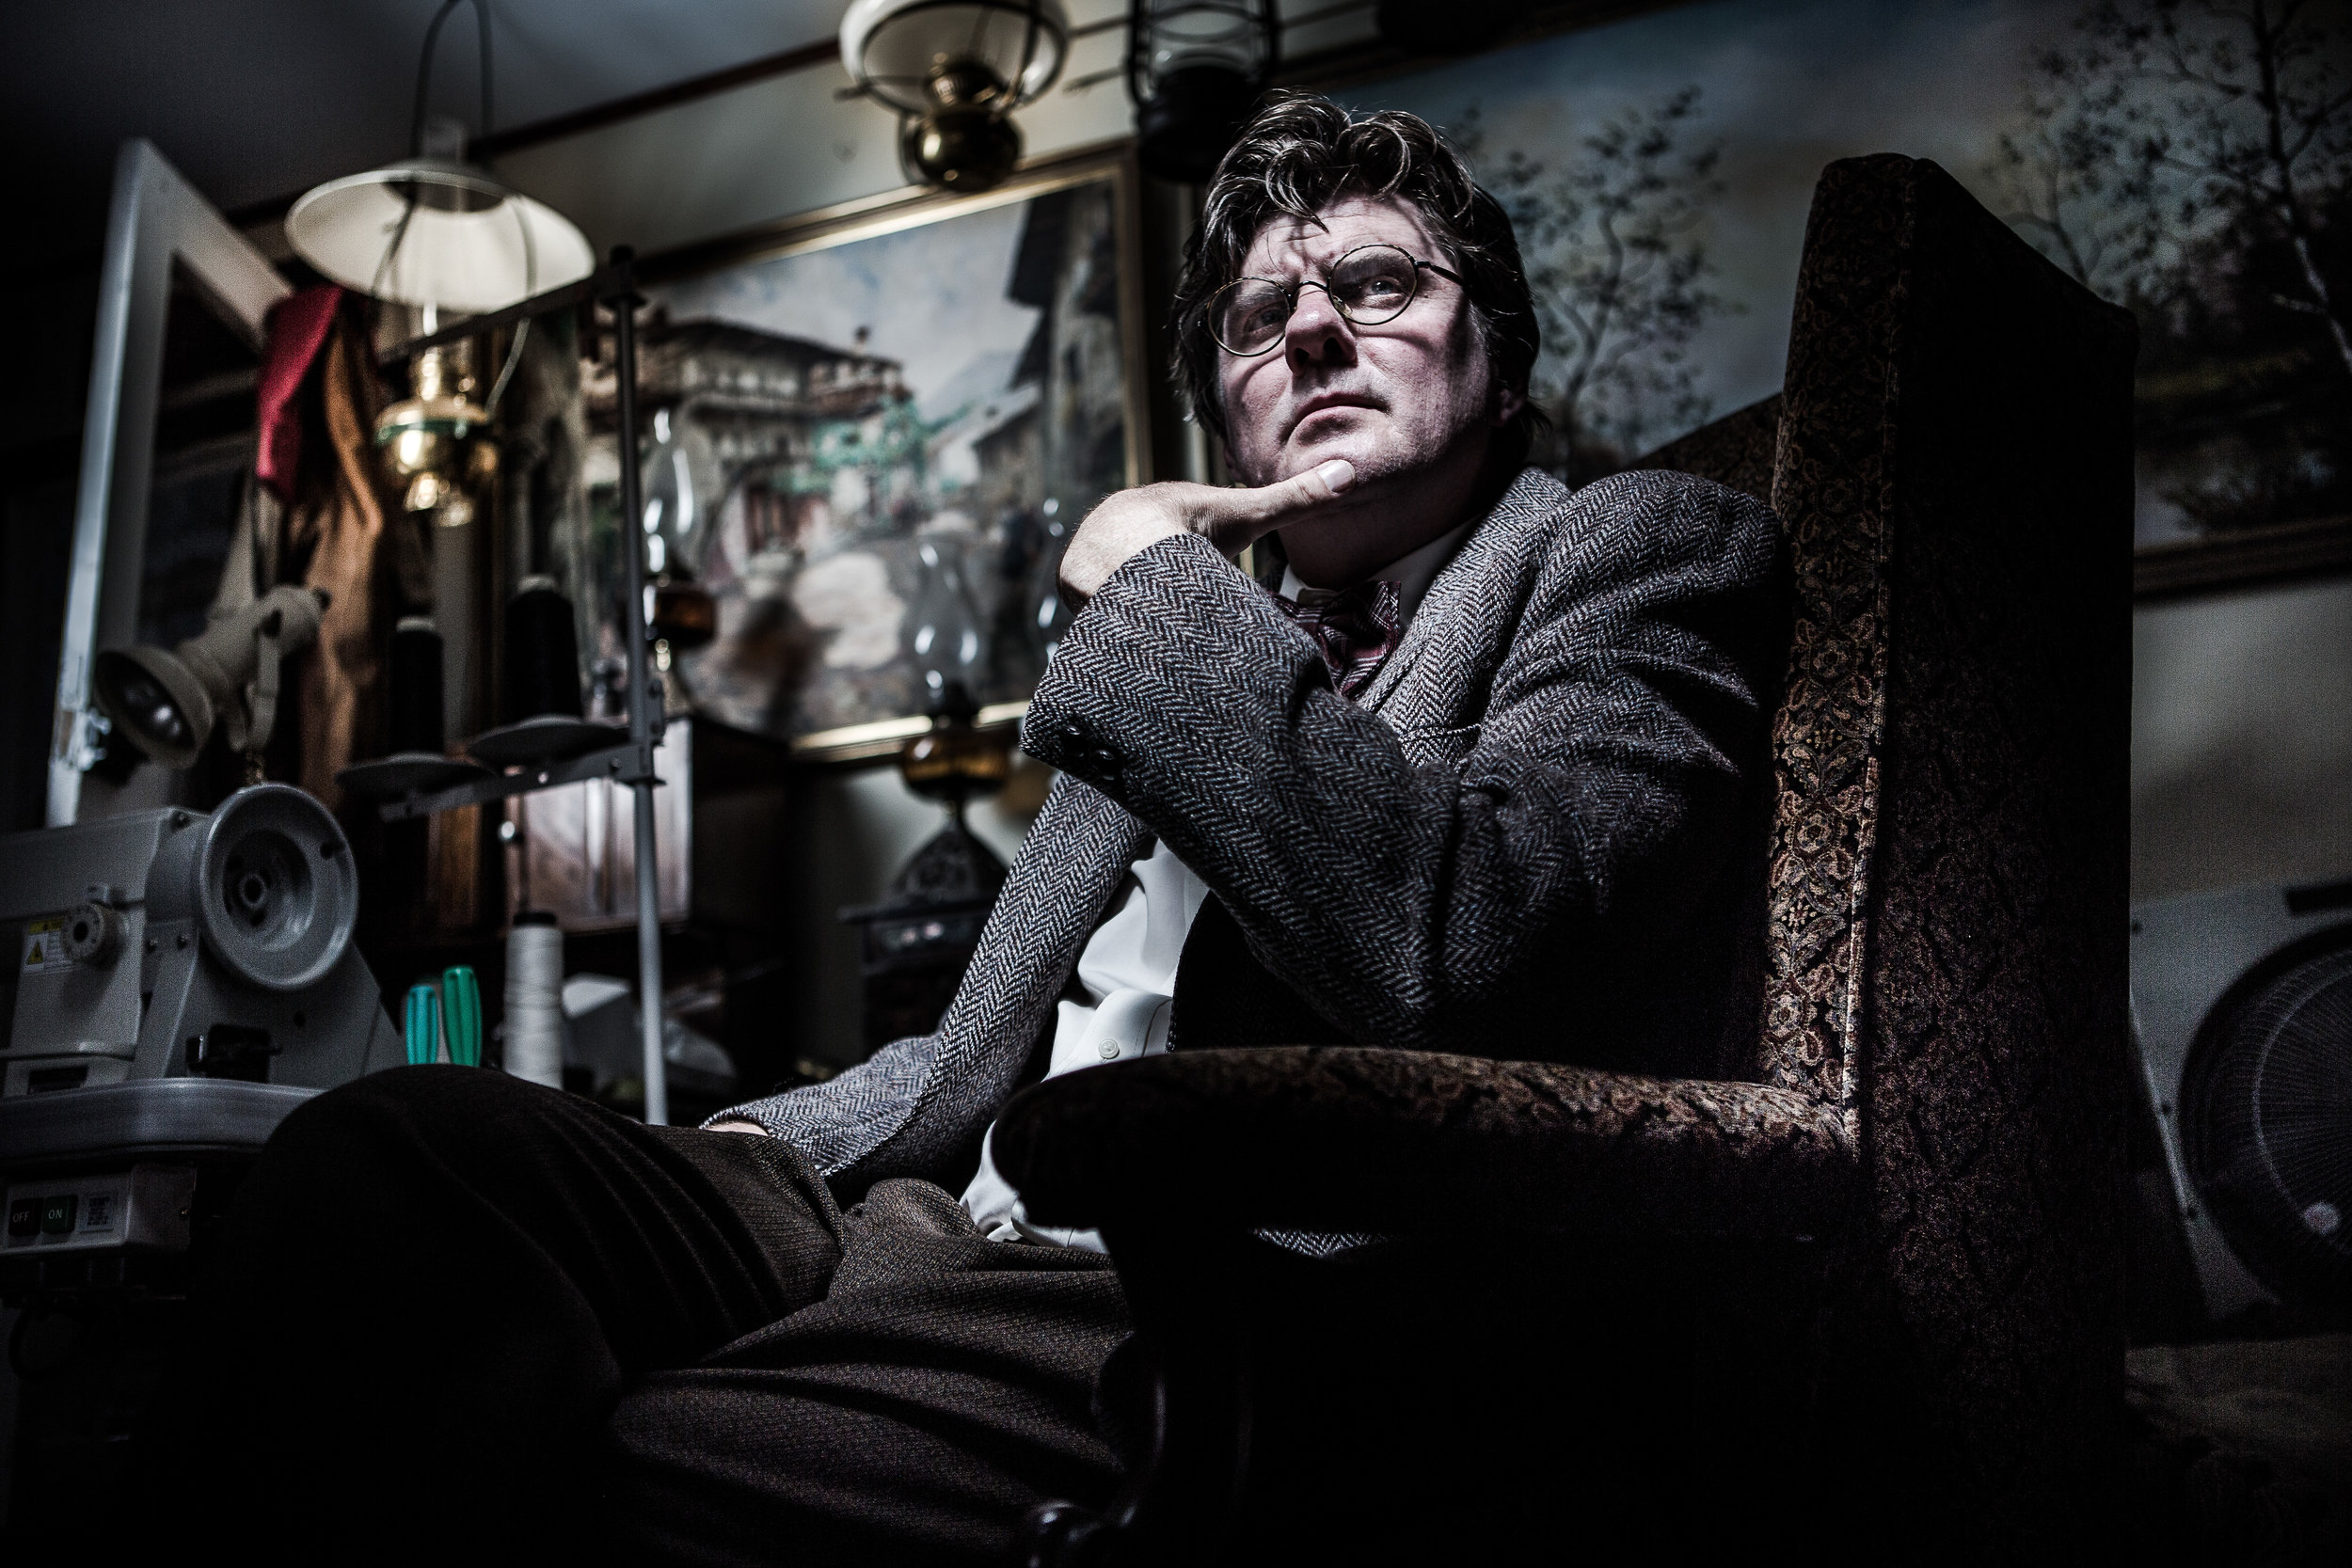 Television production character portrait by Melbourne Photographer Chalk Studio